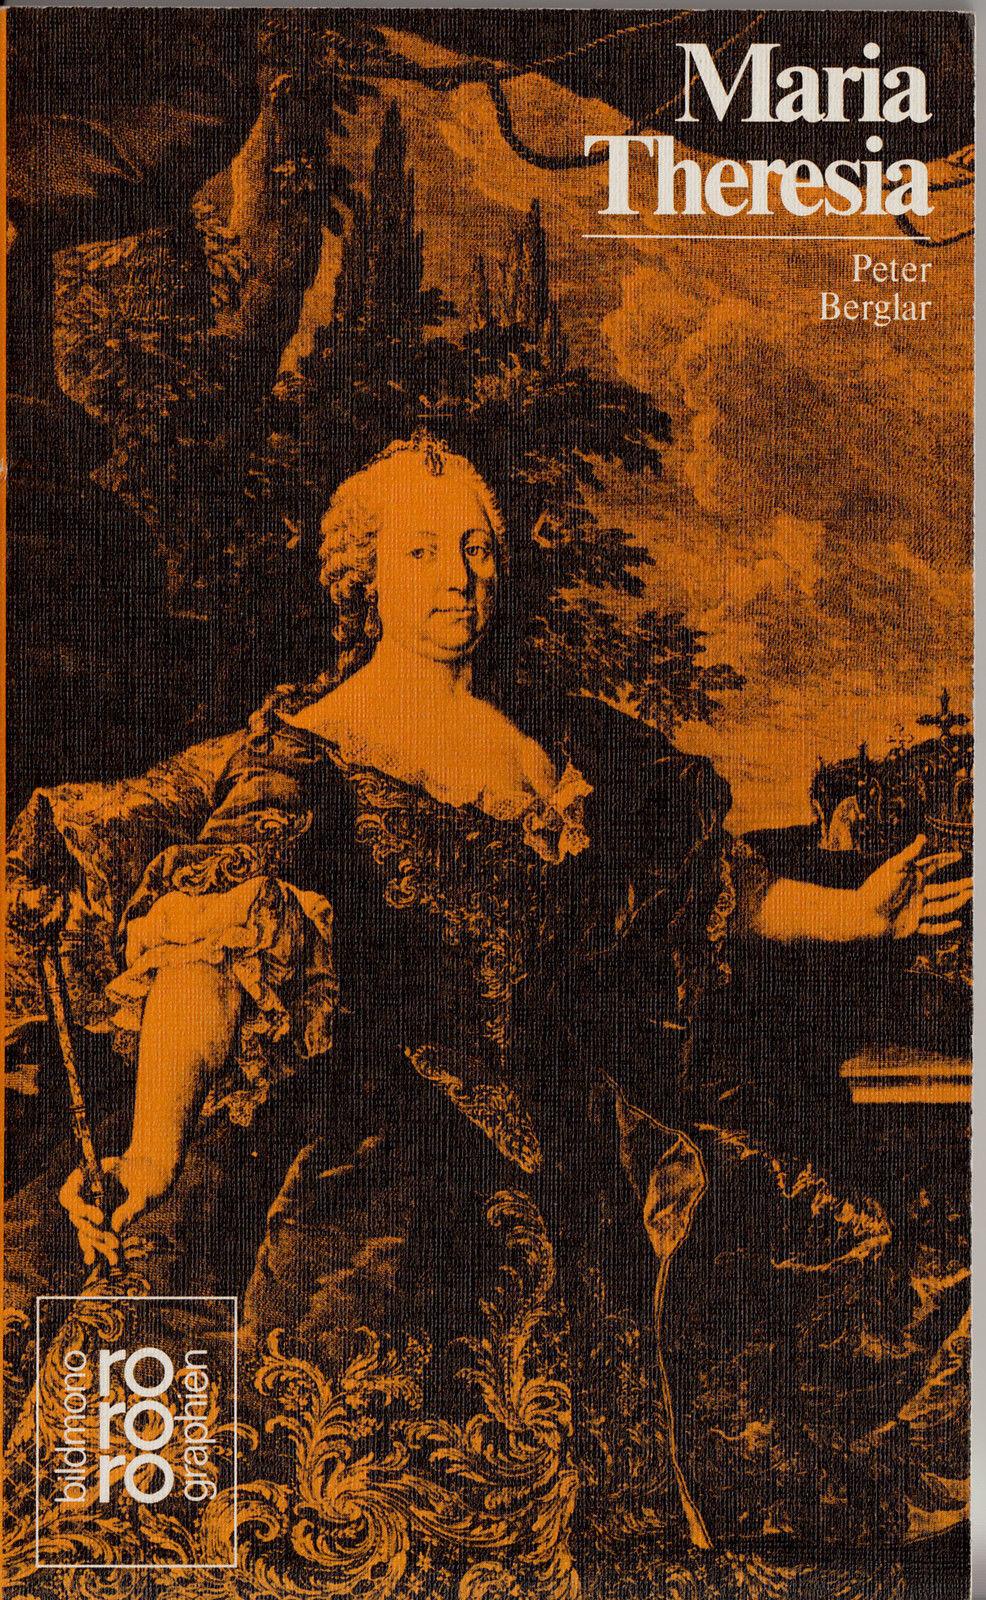 ro- 286 BERGLAT : MARIA THERESIA       rowohlts monographien a